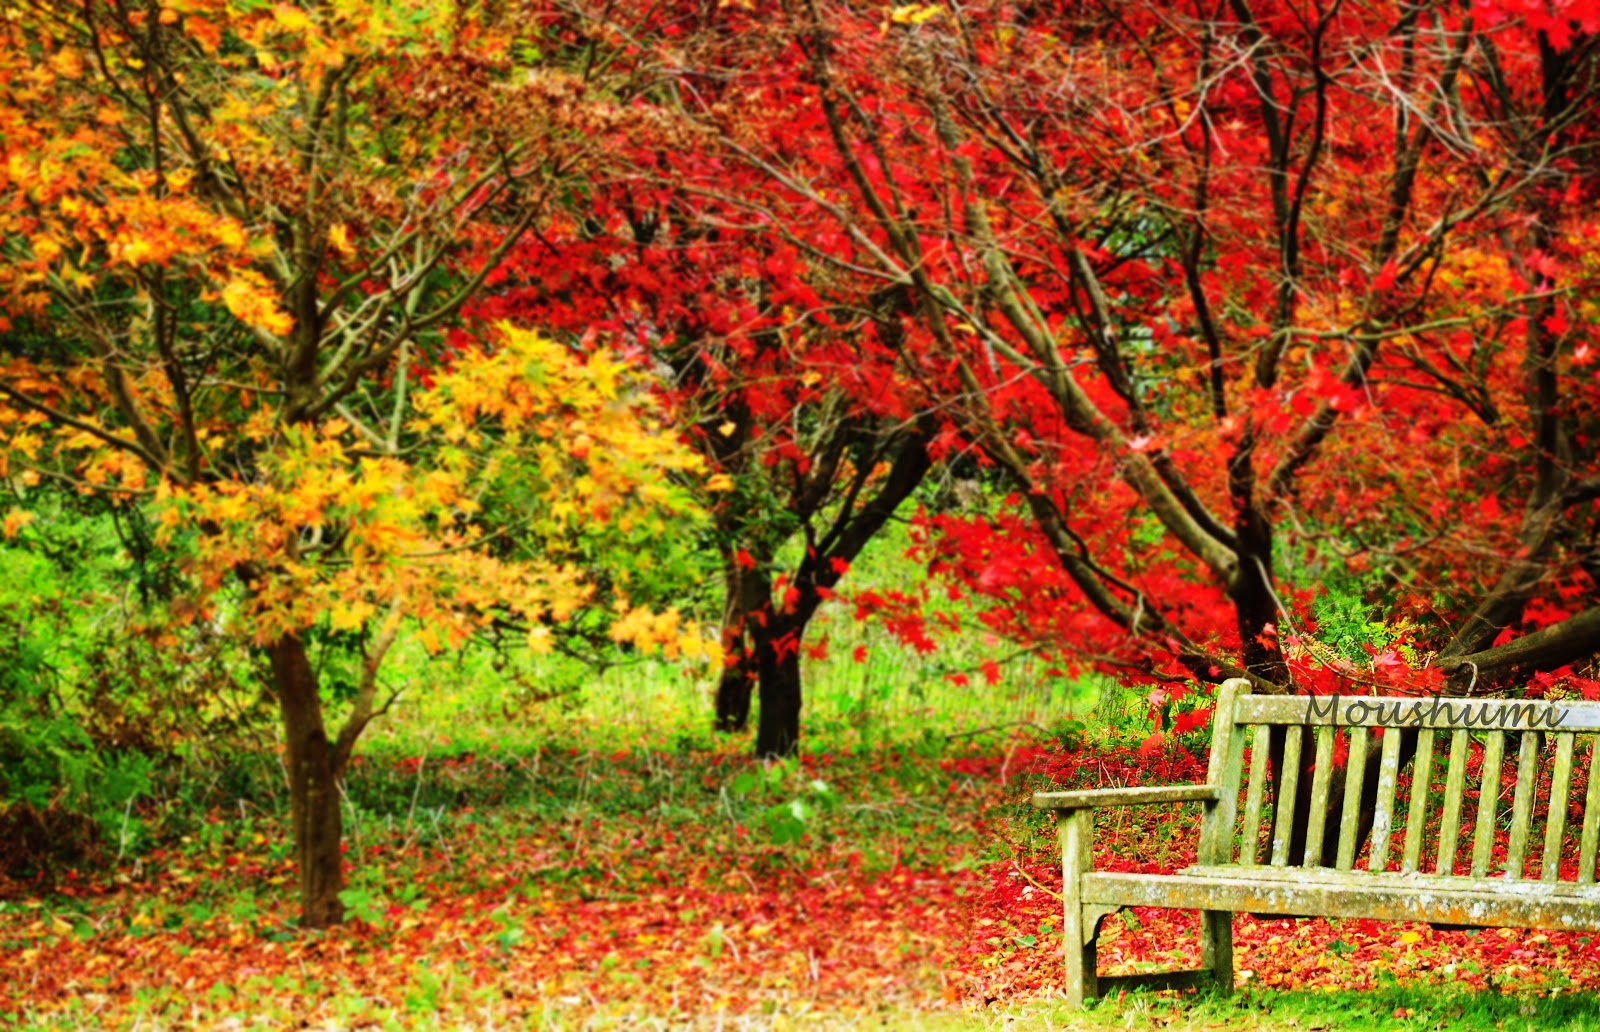 November Desktop Backgrounds Autumn Wallpaper Nature November 1600x1032 Download Hd Wallpaper Wallpapertip